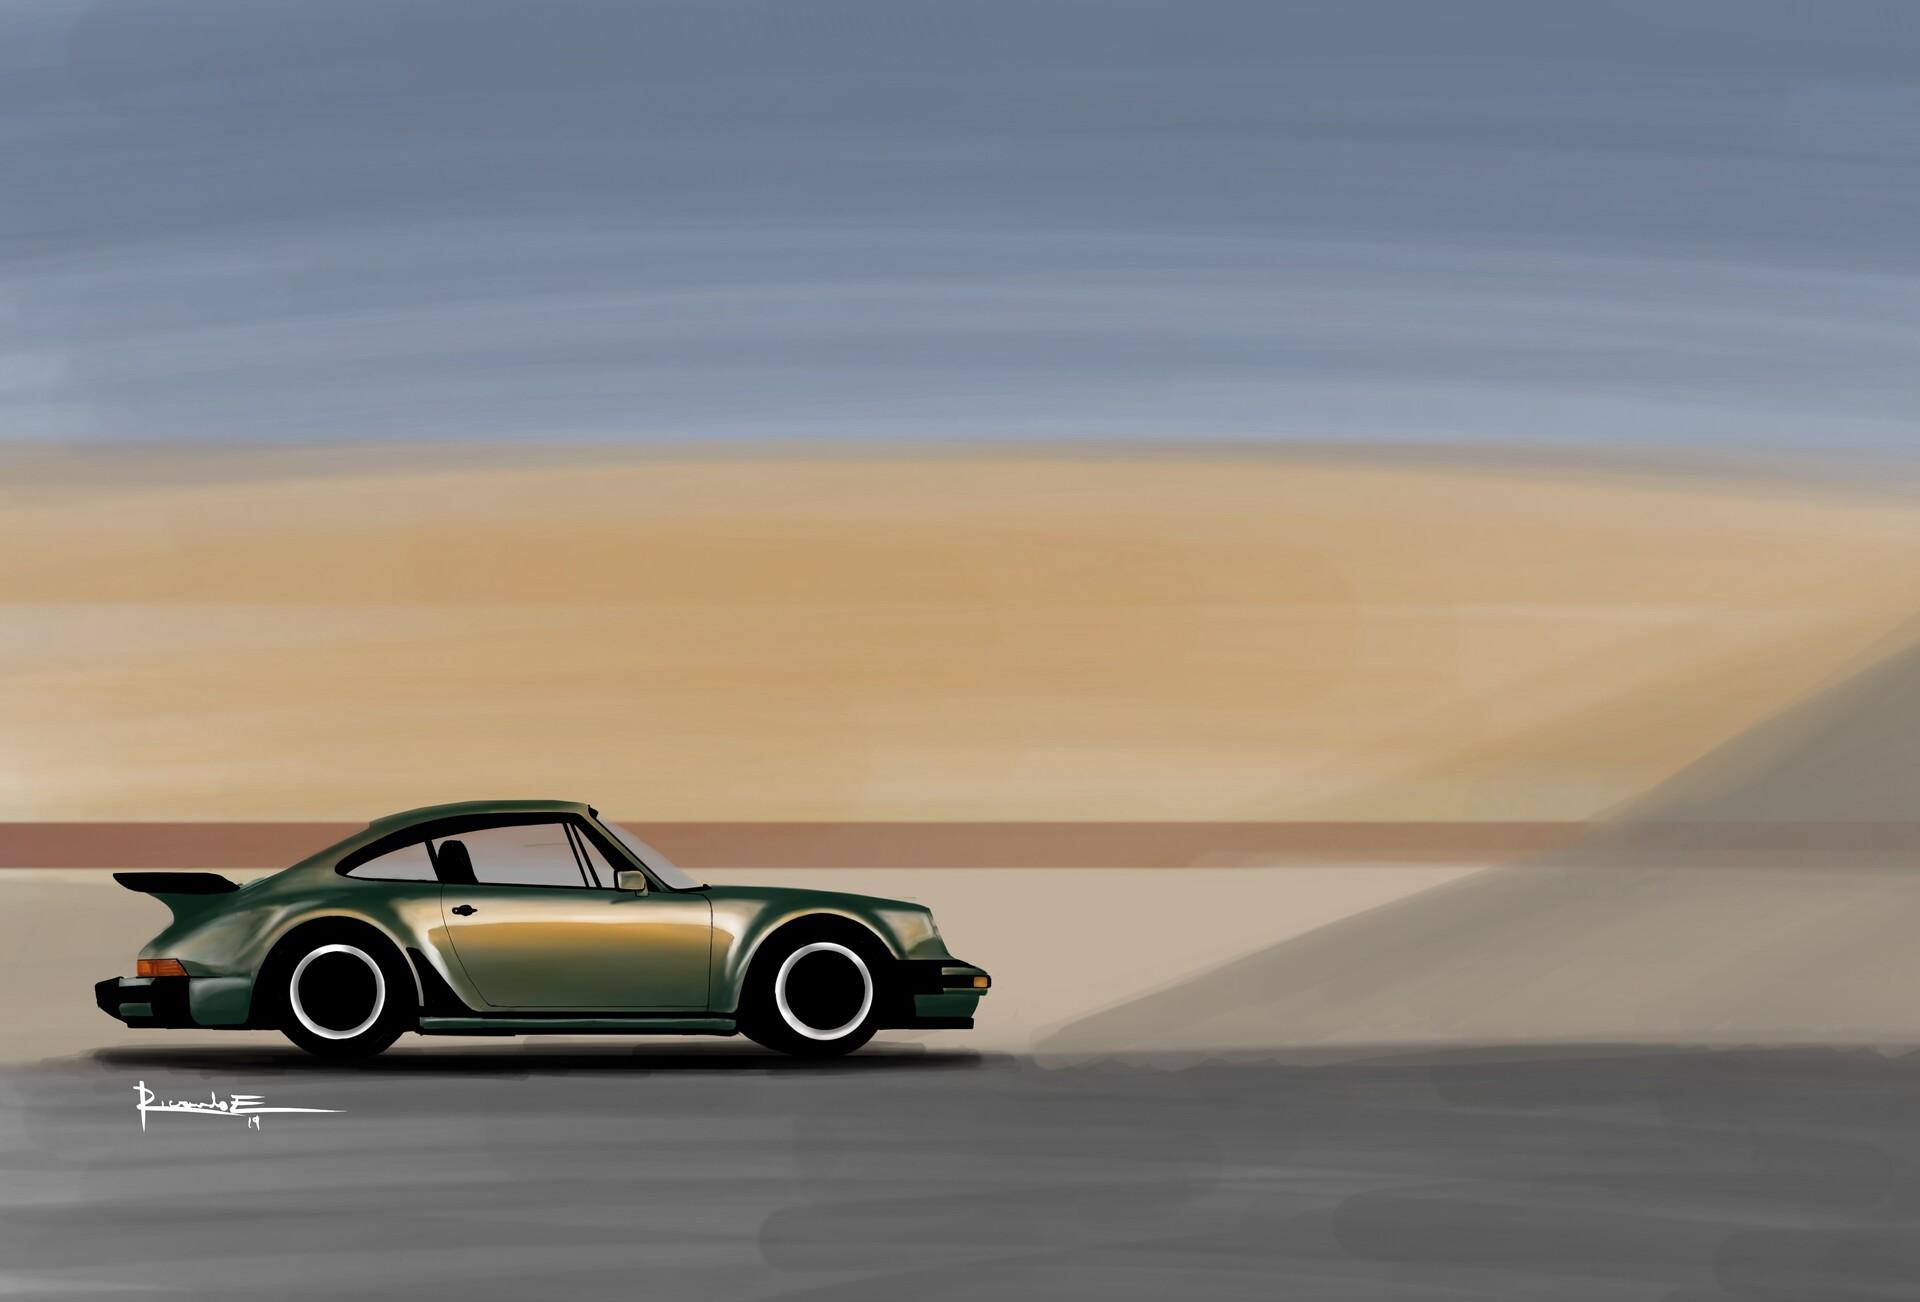 Ricardo Echeverria 1980 Porsche 911 Turbo